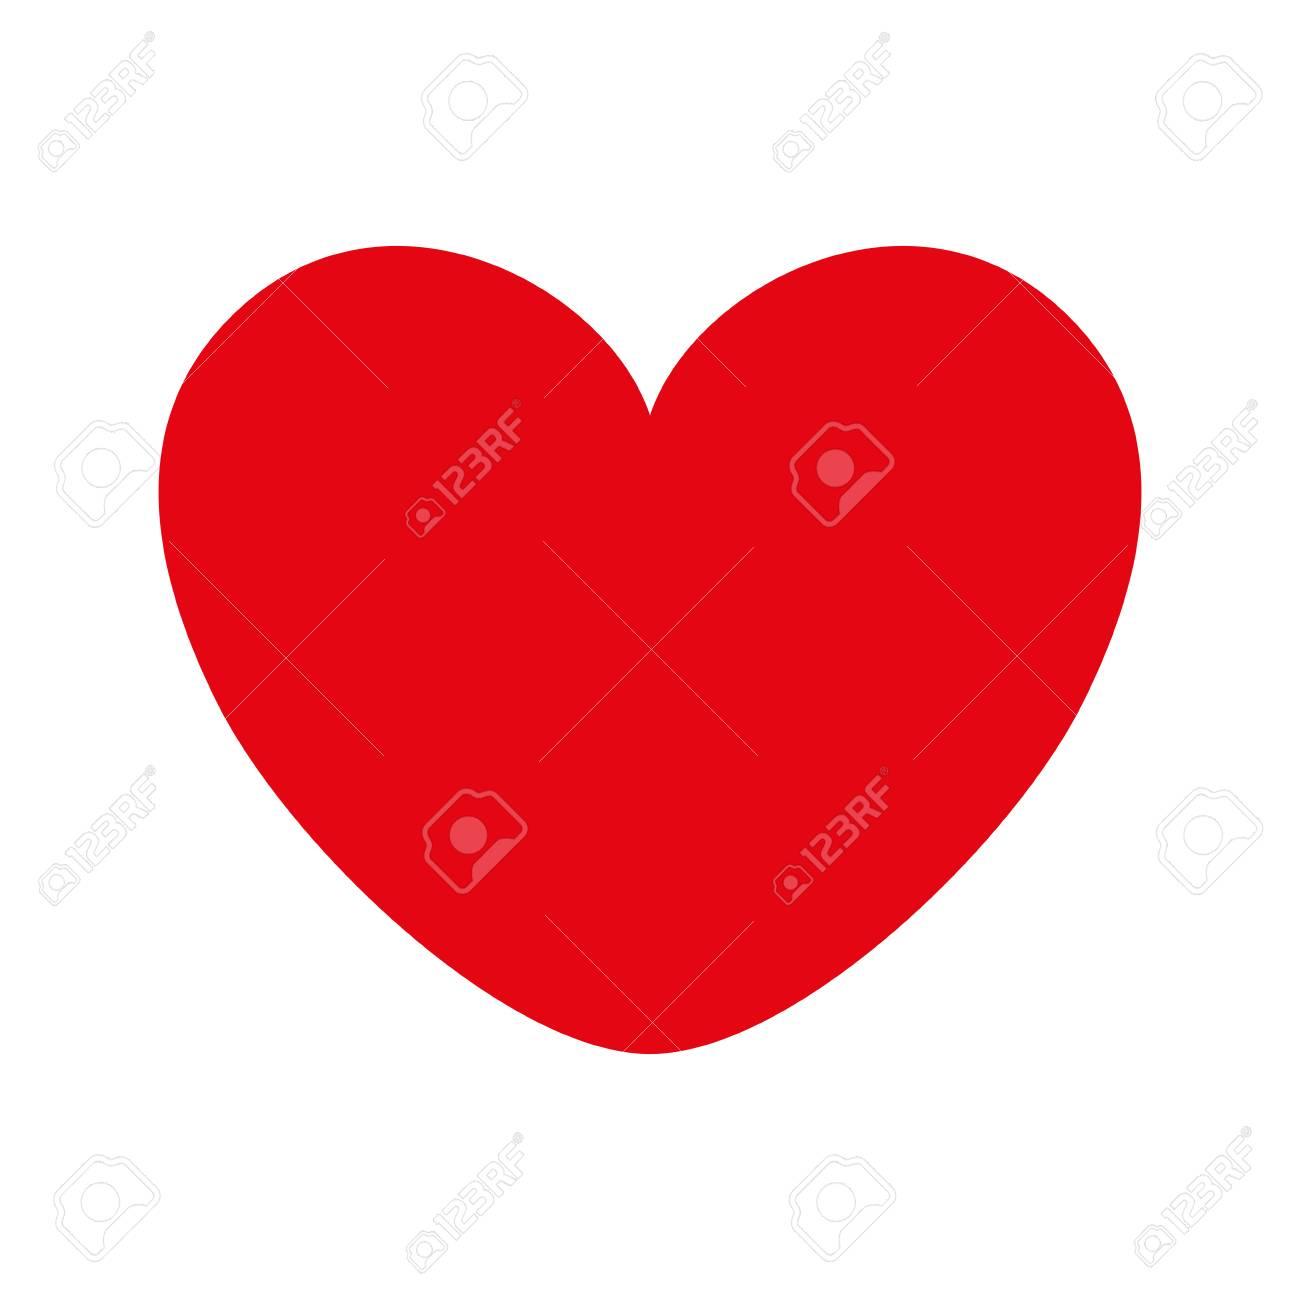 Corazón Amor Romance Pasión Amour Ilustración Vectorial De Color Rojo